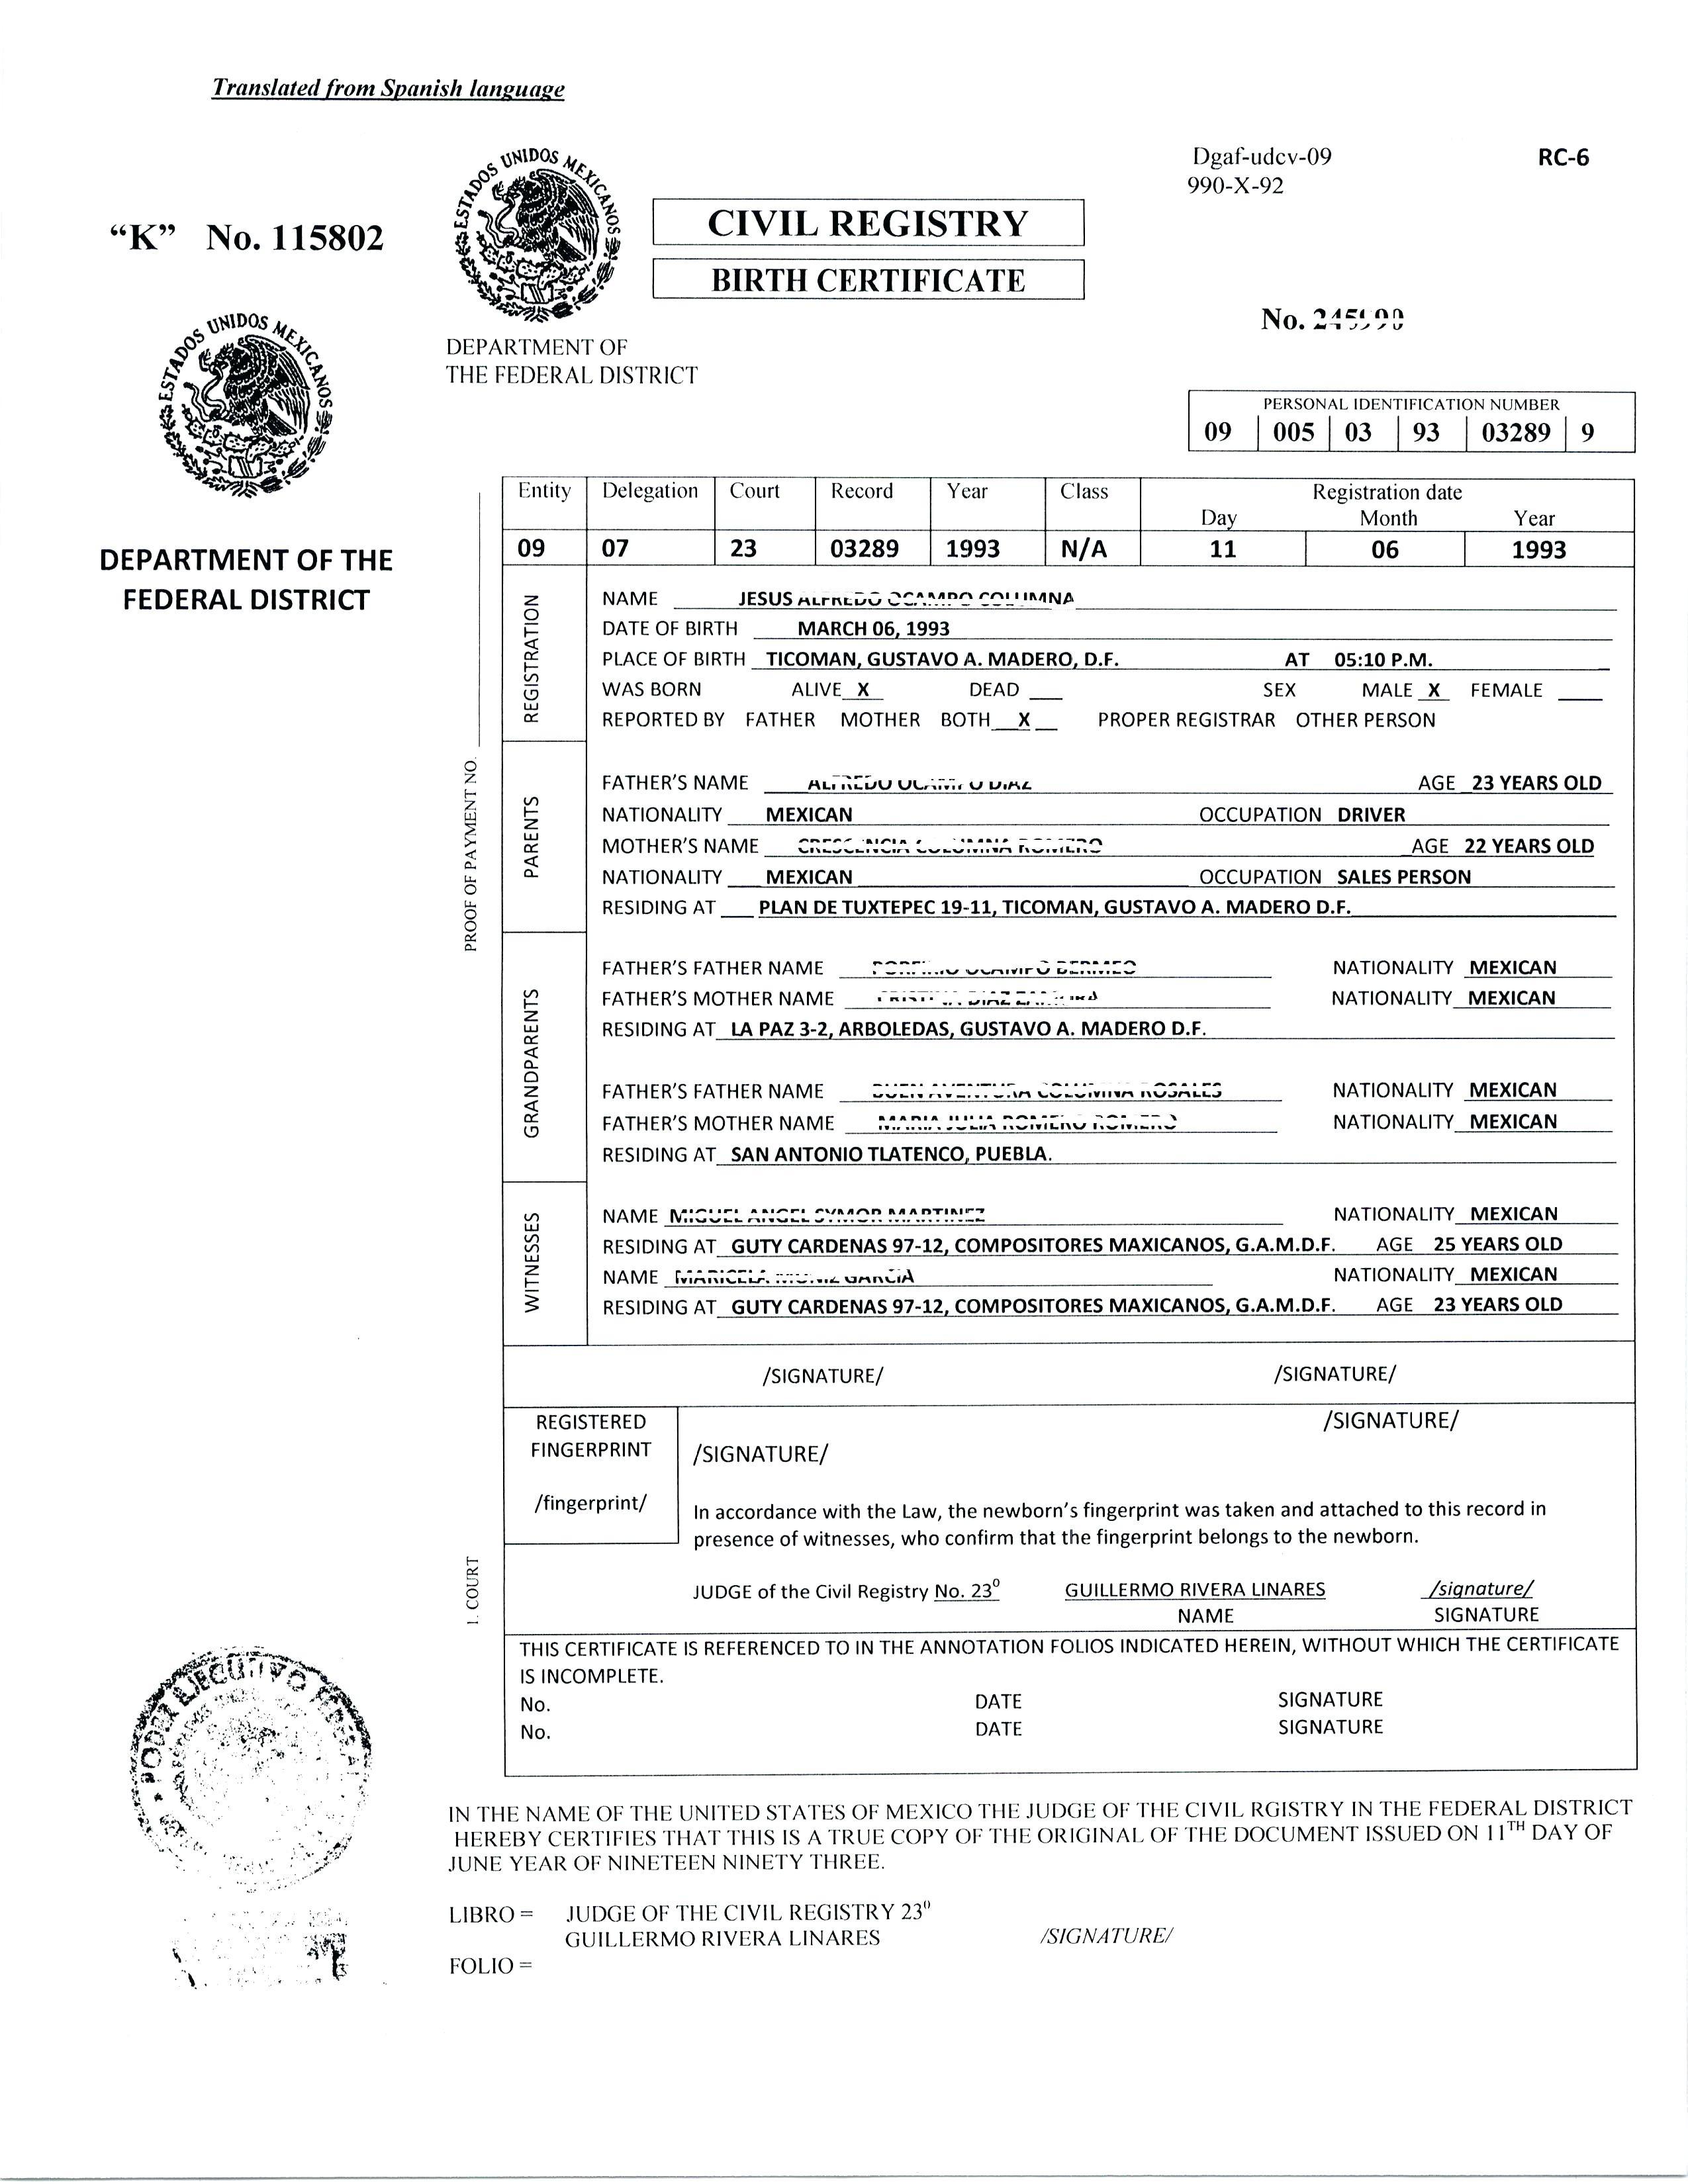 14 Elegant Birth Certificate Translation Template Land Of